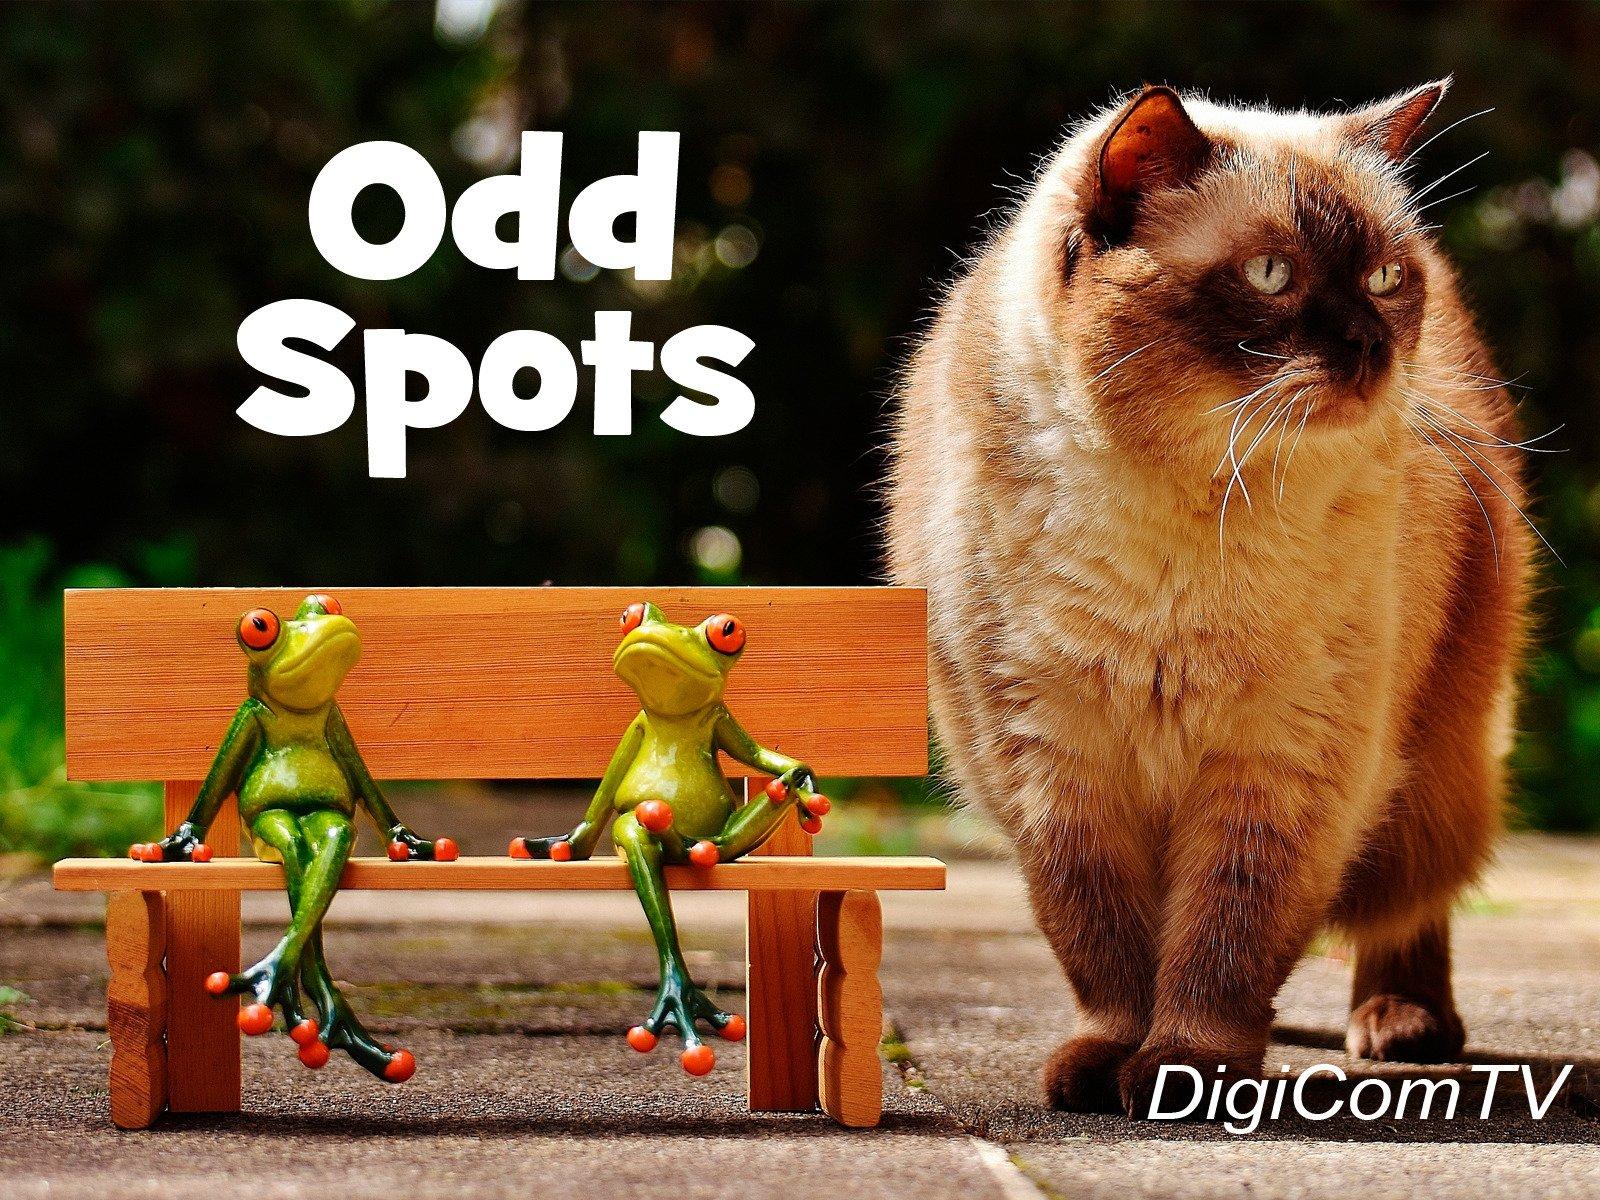 Odd Spots - Season 1